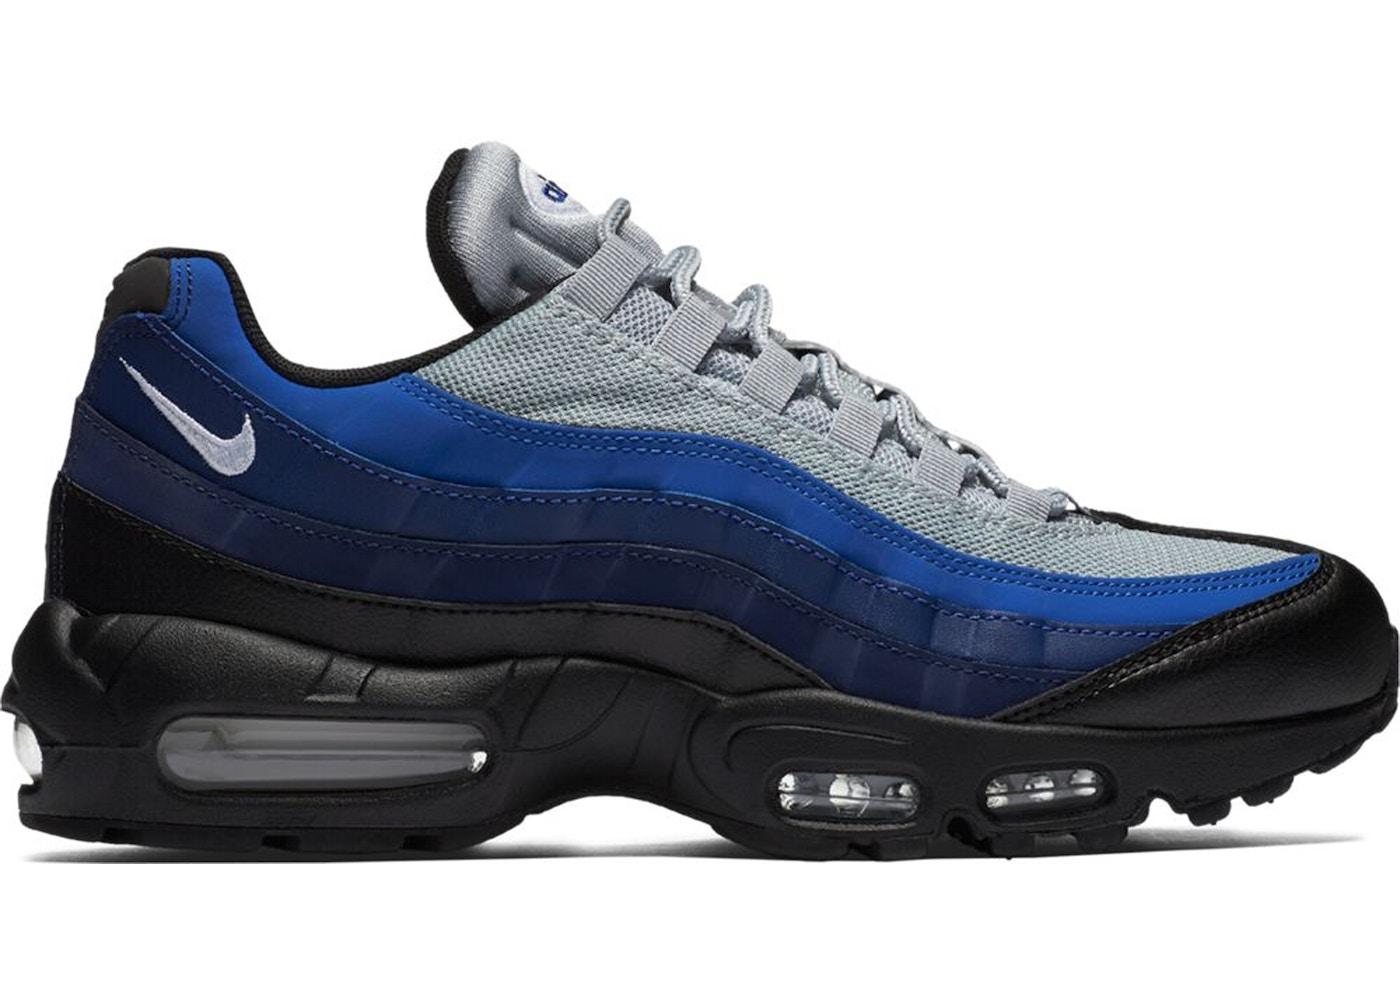 Nike Air Max 95 Black Blue New